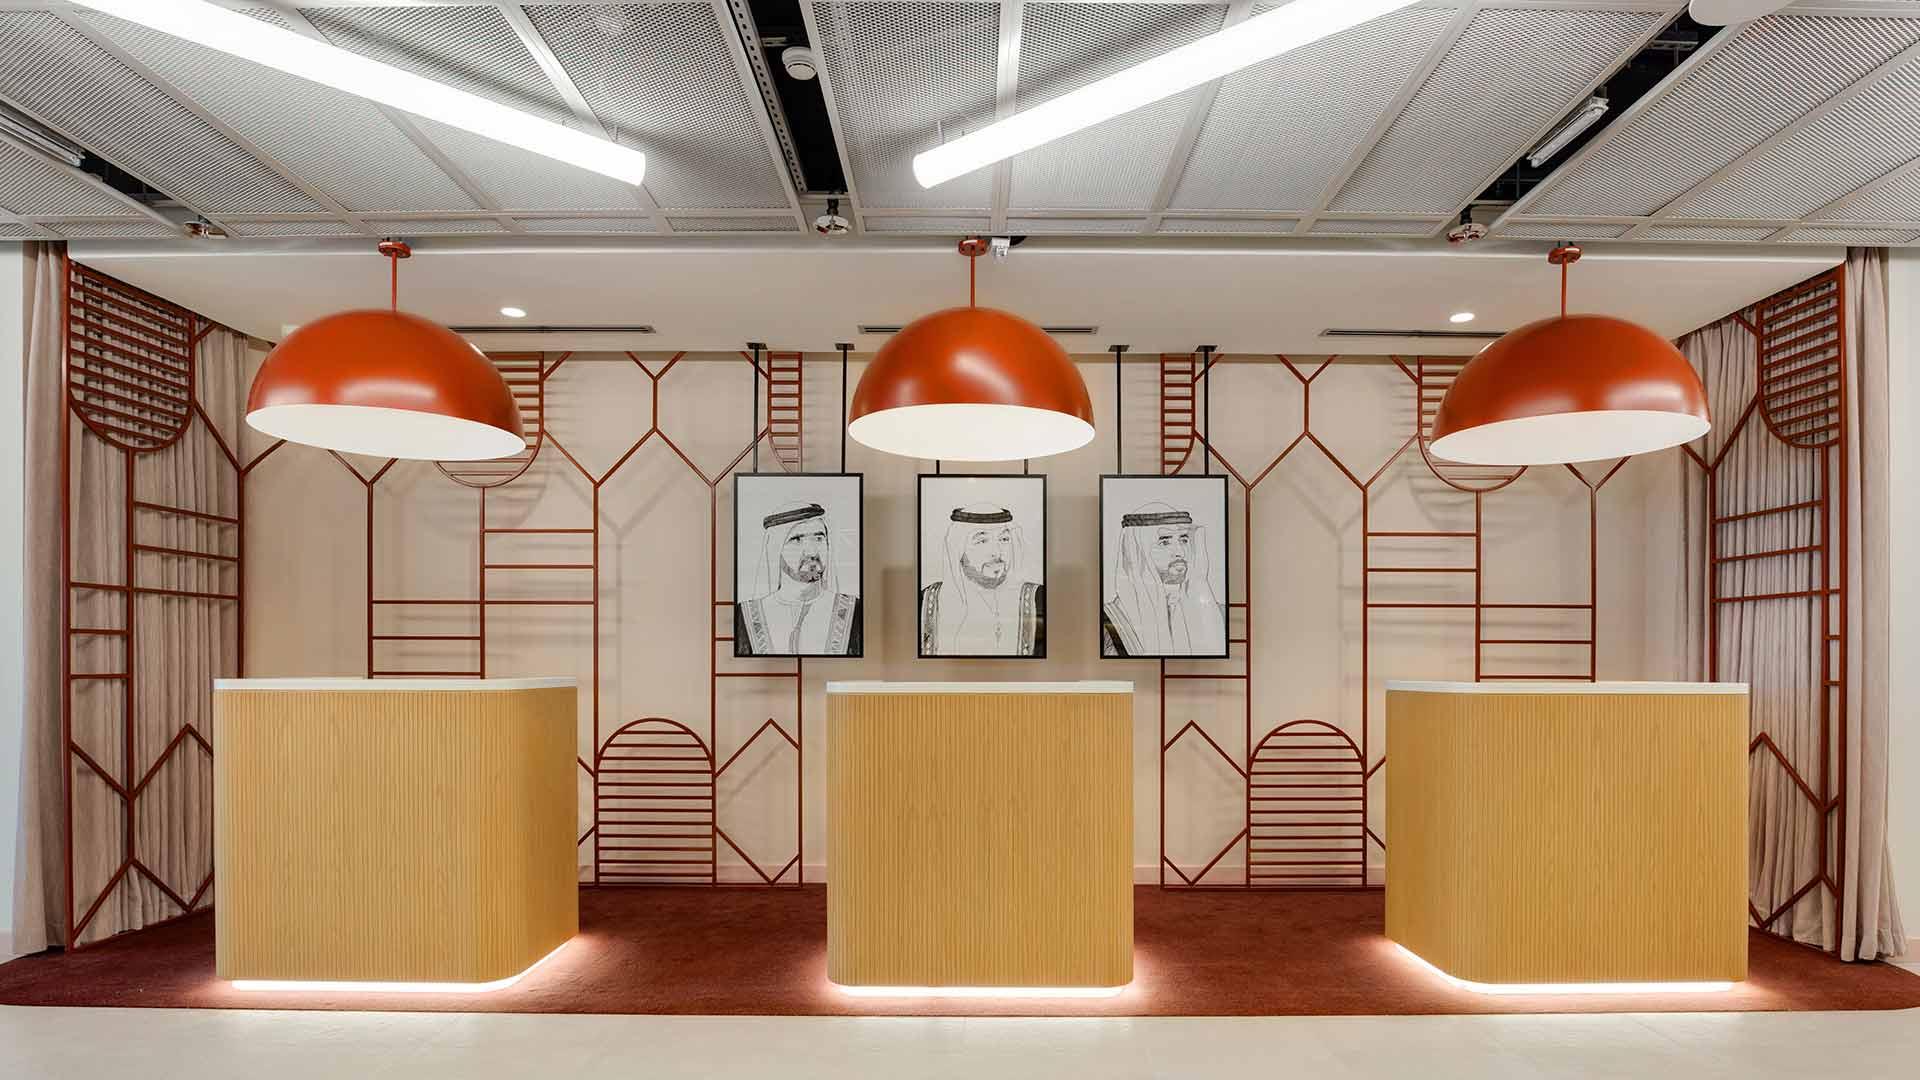 Lighting Design Hotel Reception Modern Trendy Interior Illuminated Reception Desks Oversized Orange Pendants Linear Ceiling Lights Dubai Nulty